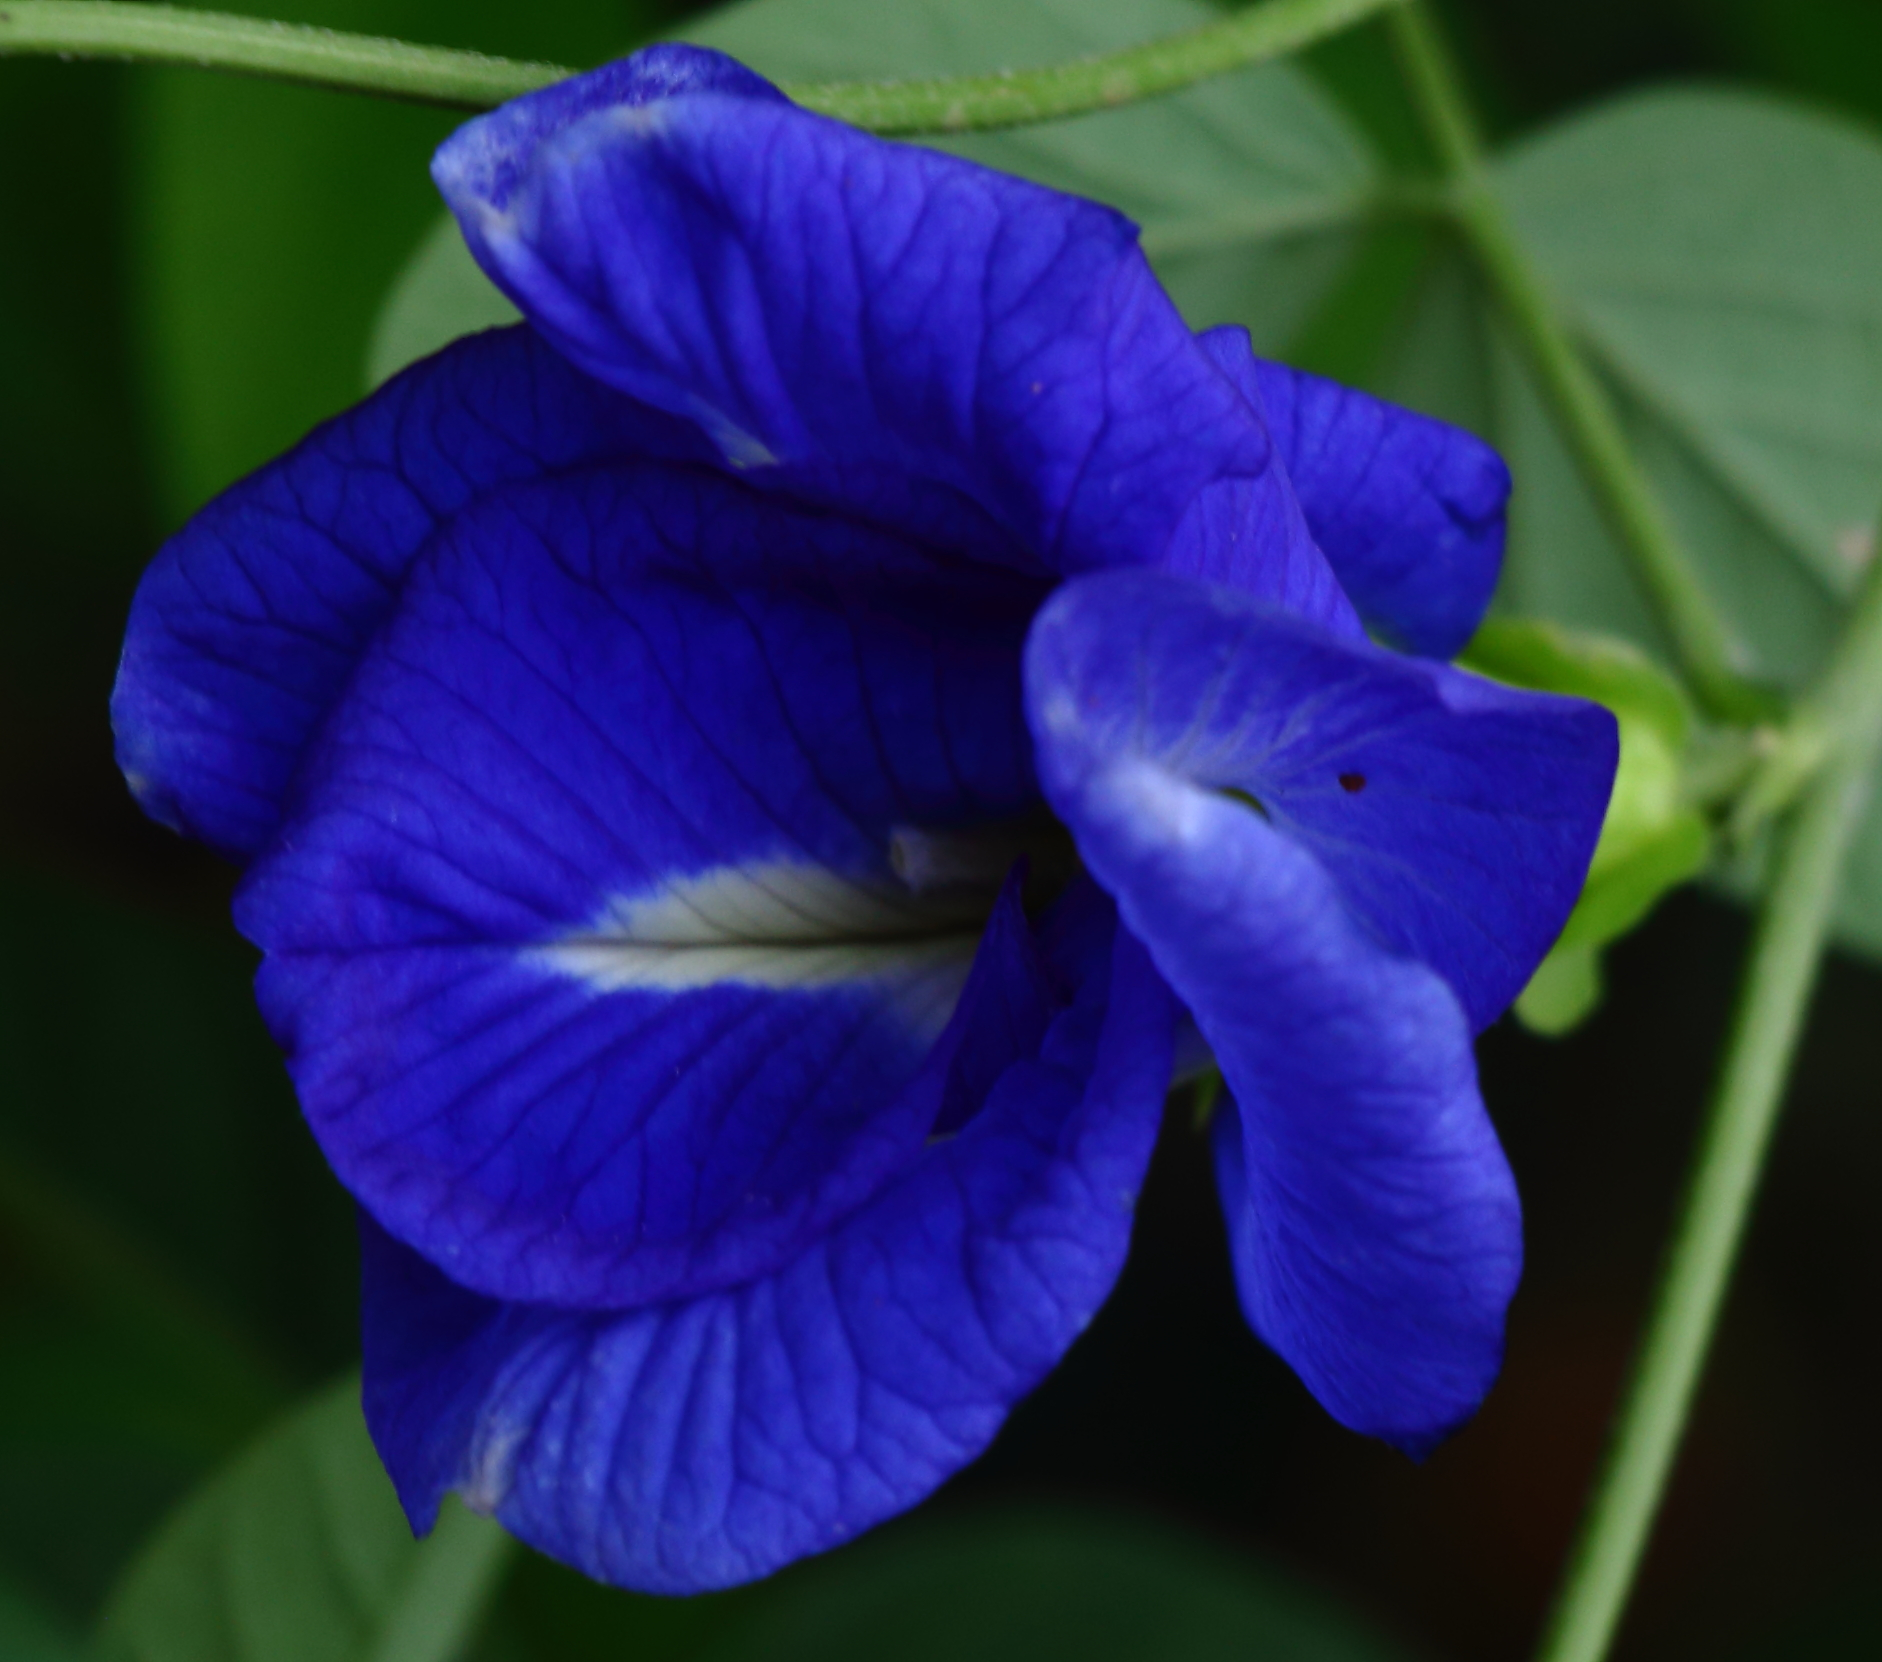 20 Seeds Clitoria ternatea Double Blue Flowering Butterfly Pea Vine